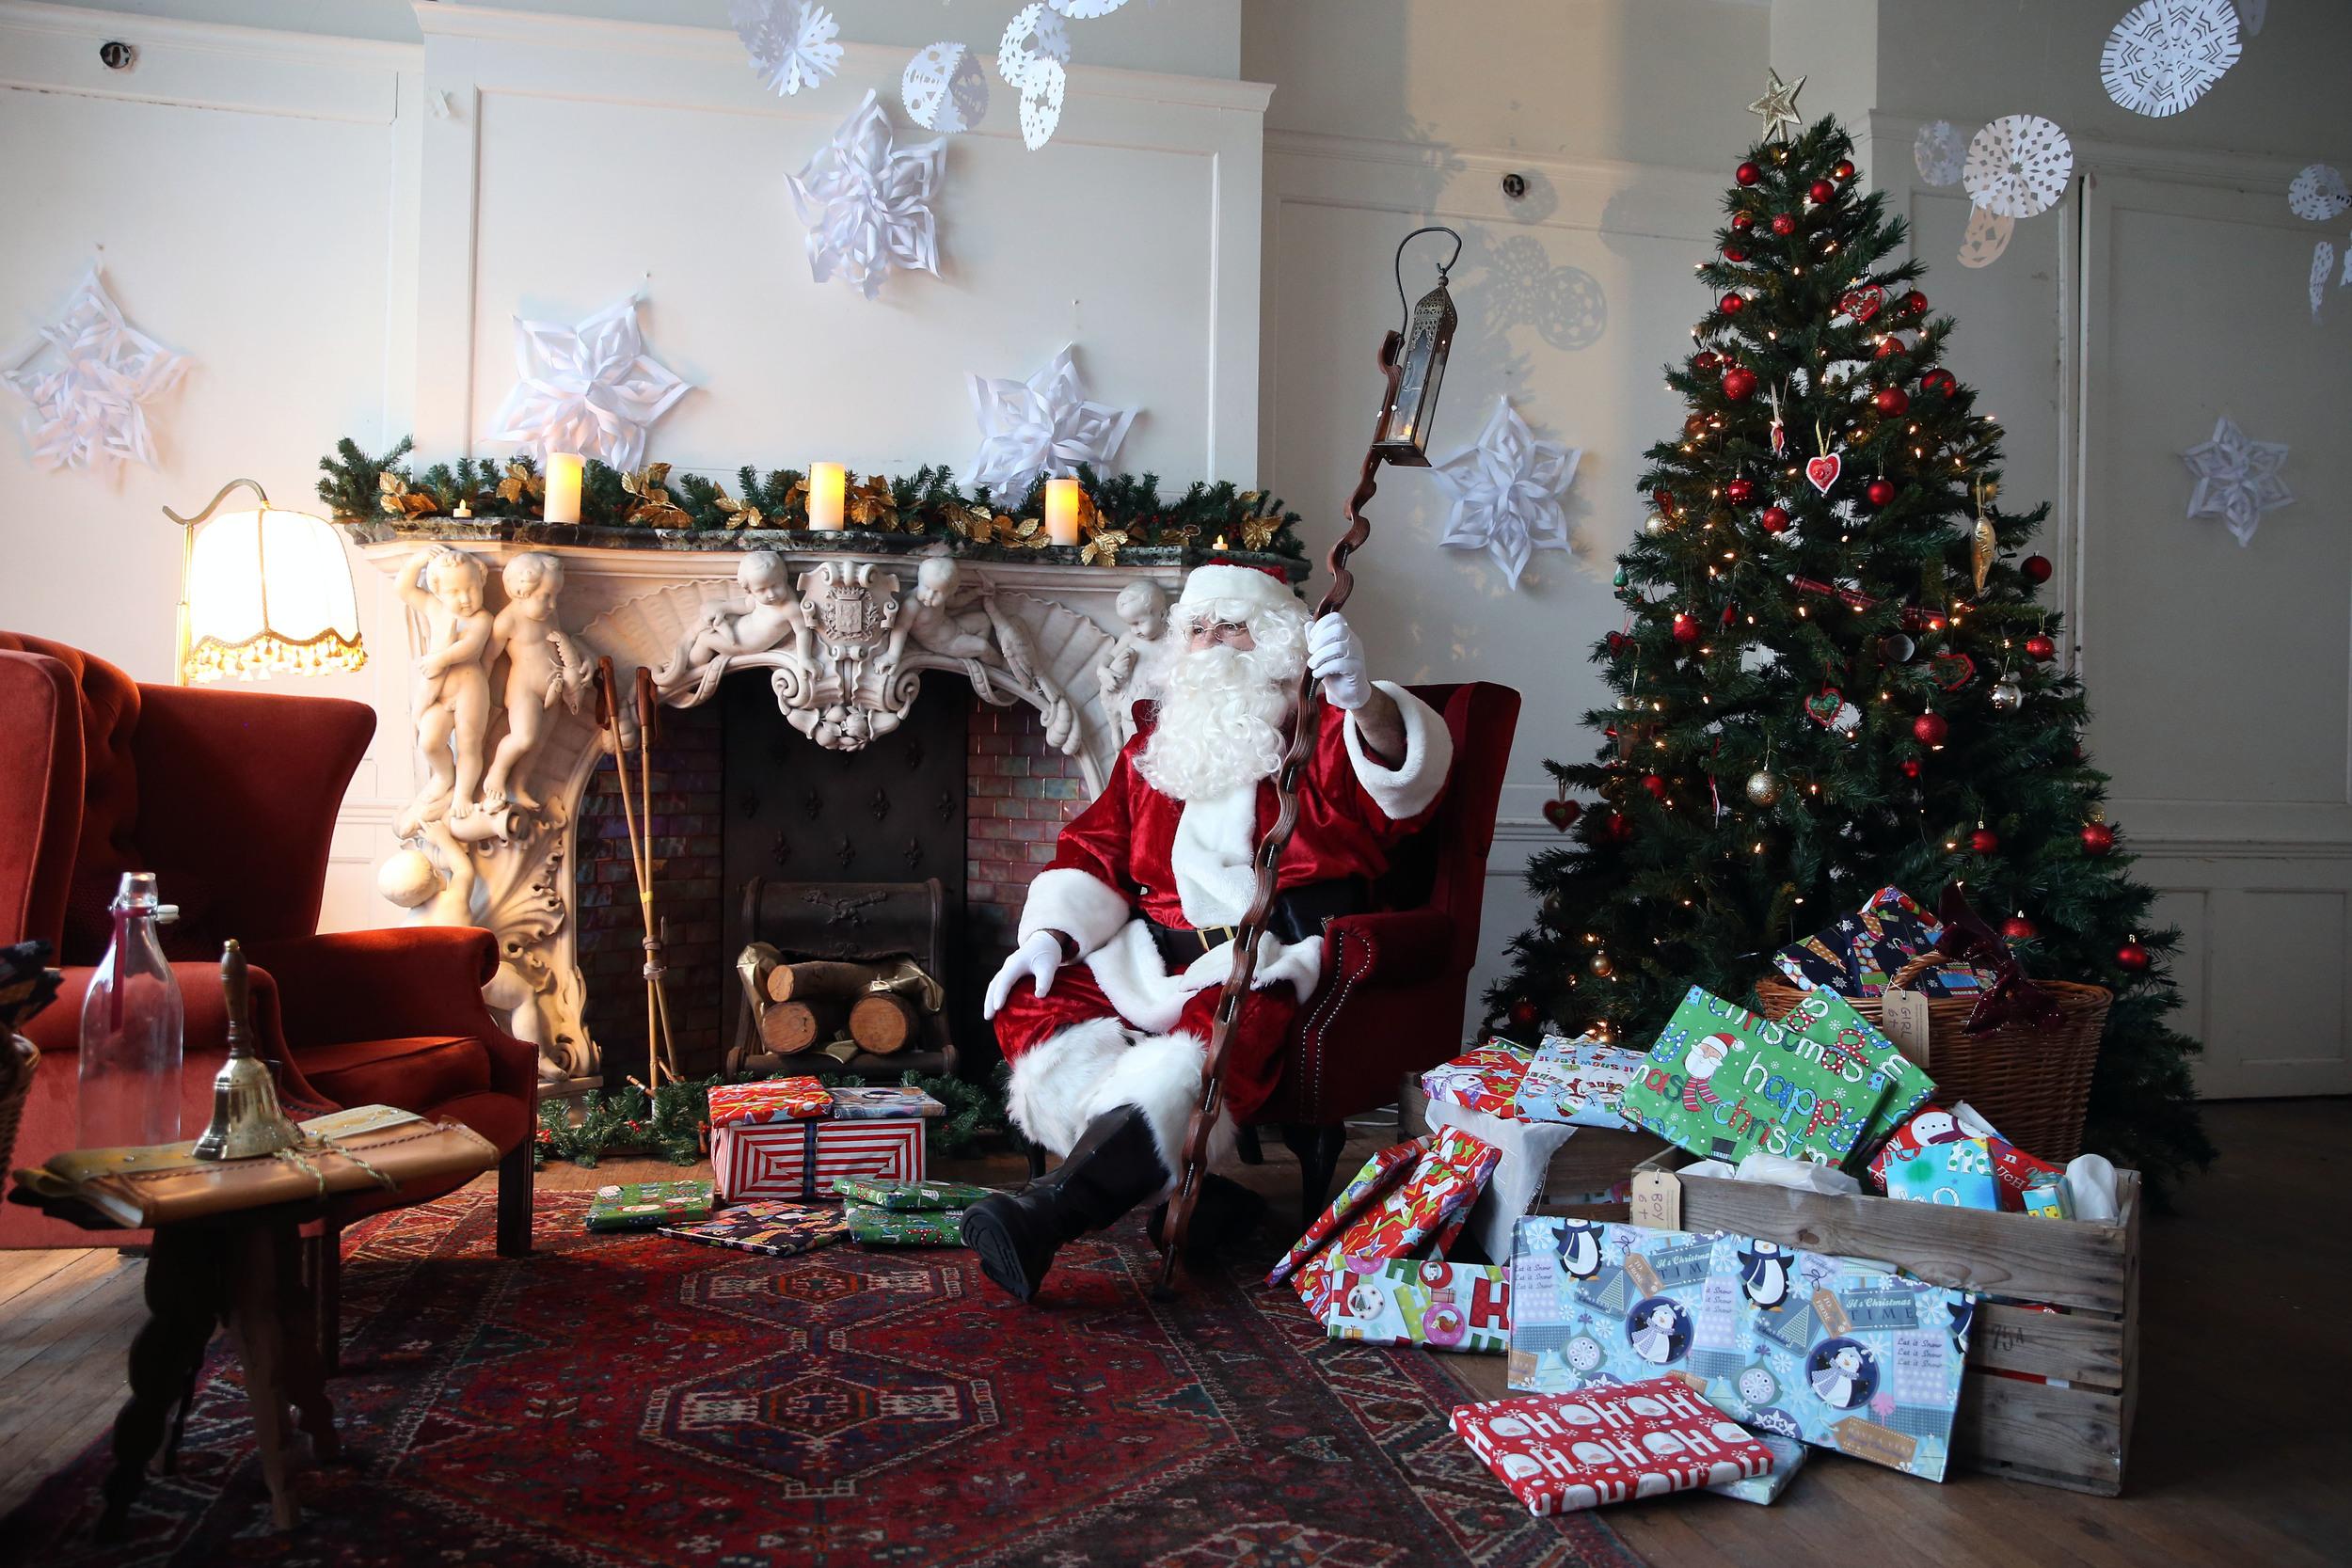 17.12.14 Christmas at Duffryn House 1.JPG